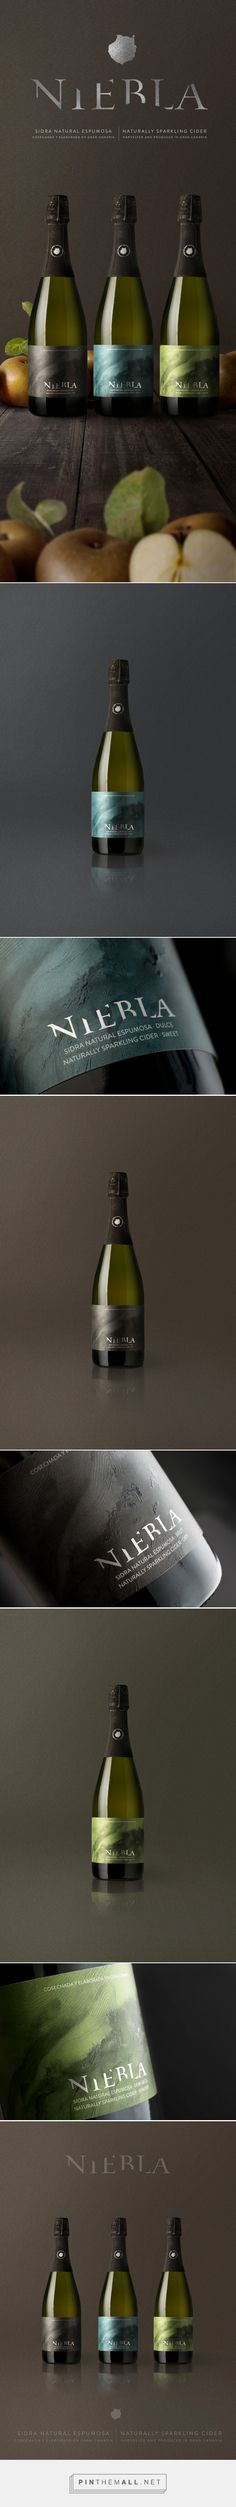 Niebla Sparkling Cider Packaging by Gama Estudio | Fivestar Branding Agency – Design and Branding Agency & Curated Inspiration Gallery